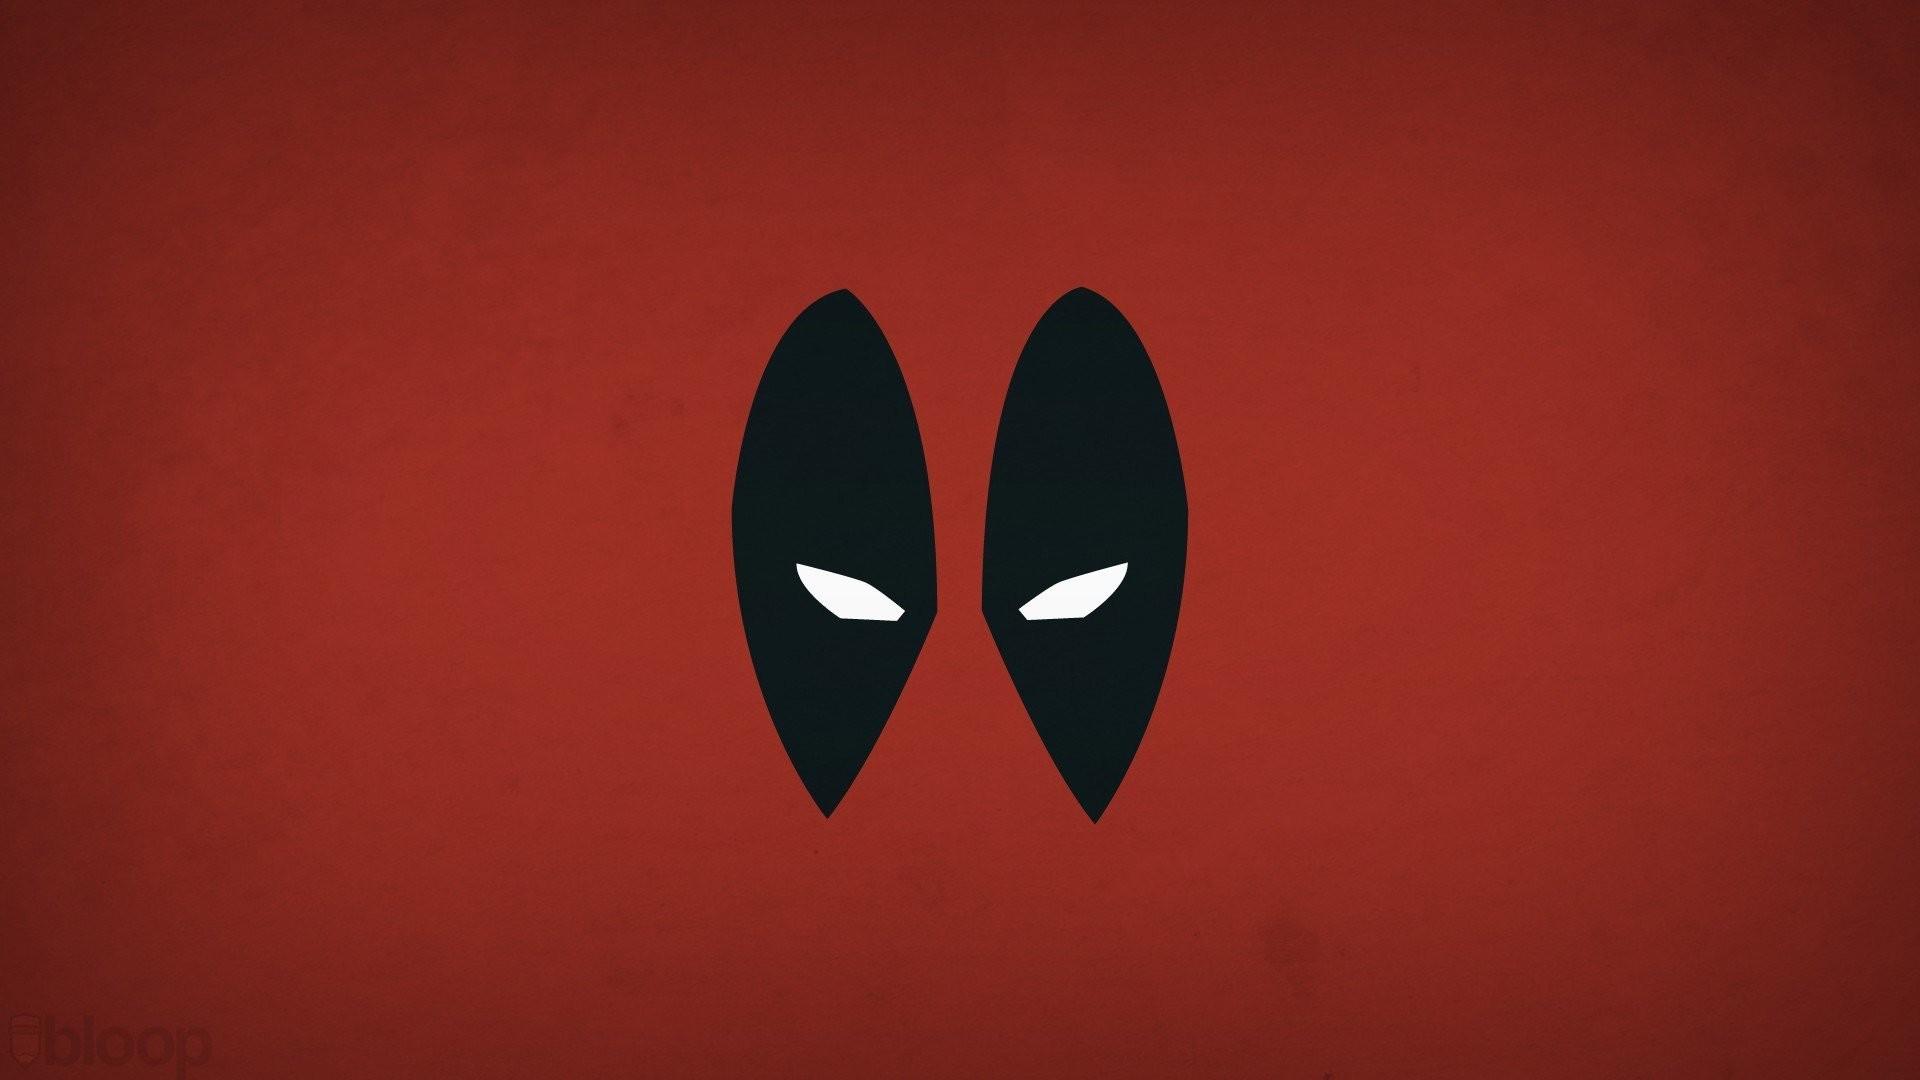 Res: 1920x1080, Marvel Deadpool (Game) Deadpool 1080p HD Wallpaper Background